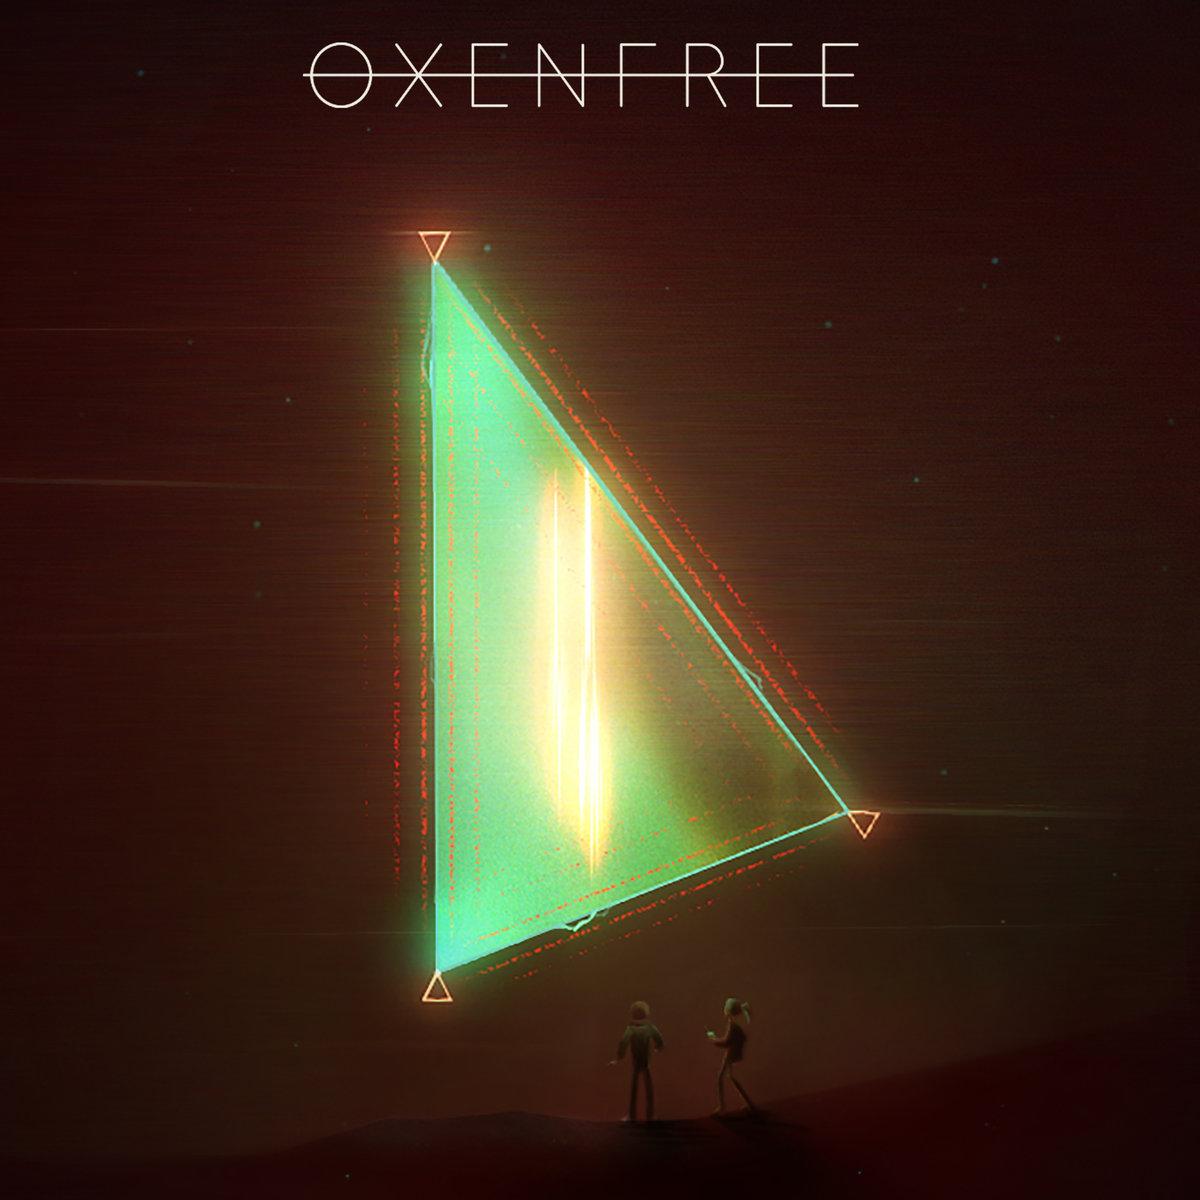 Oxenfree CODEX - Full Oyun İndir